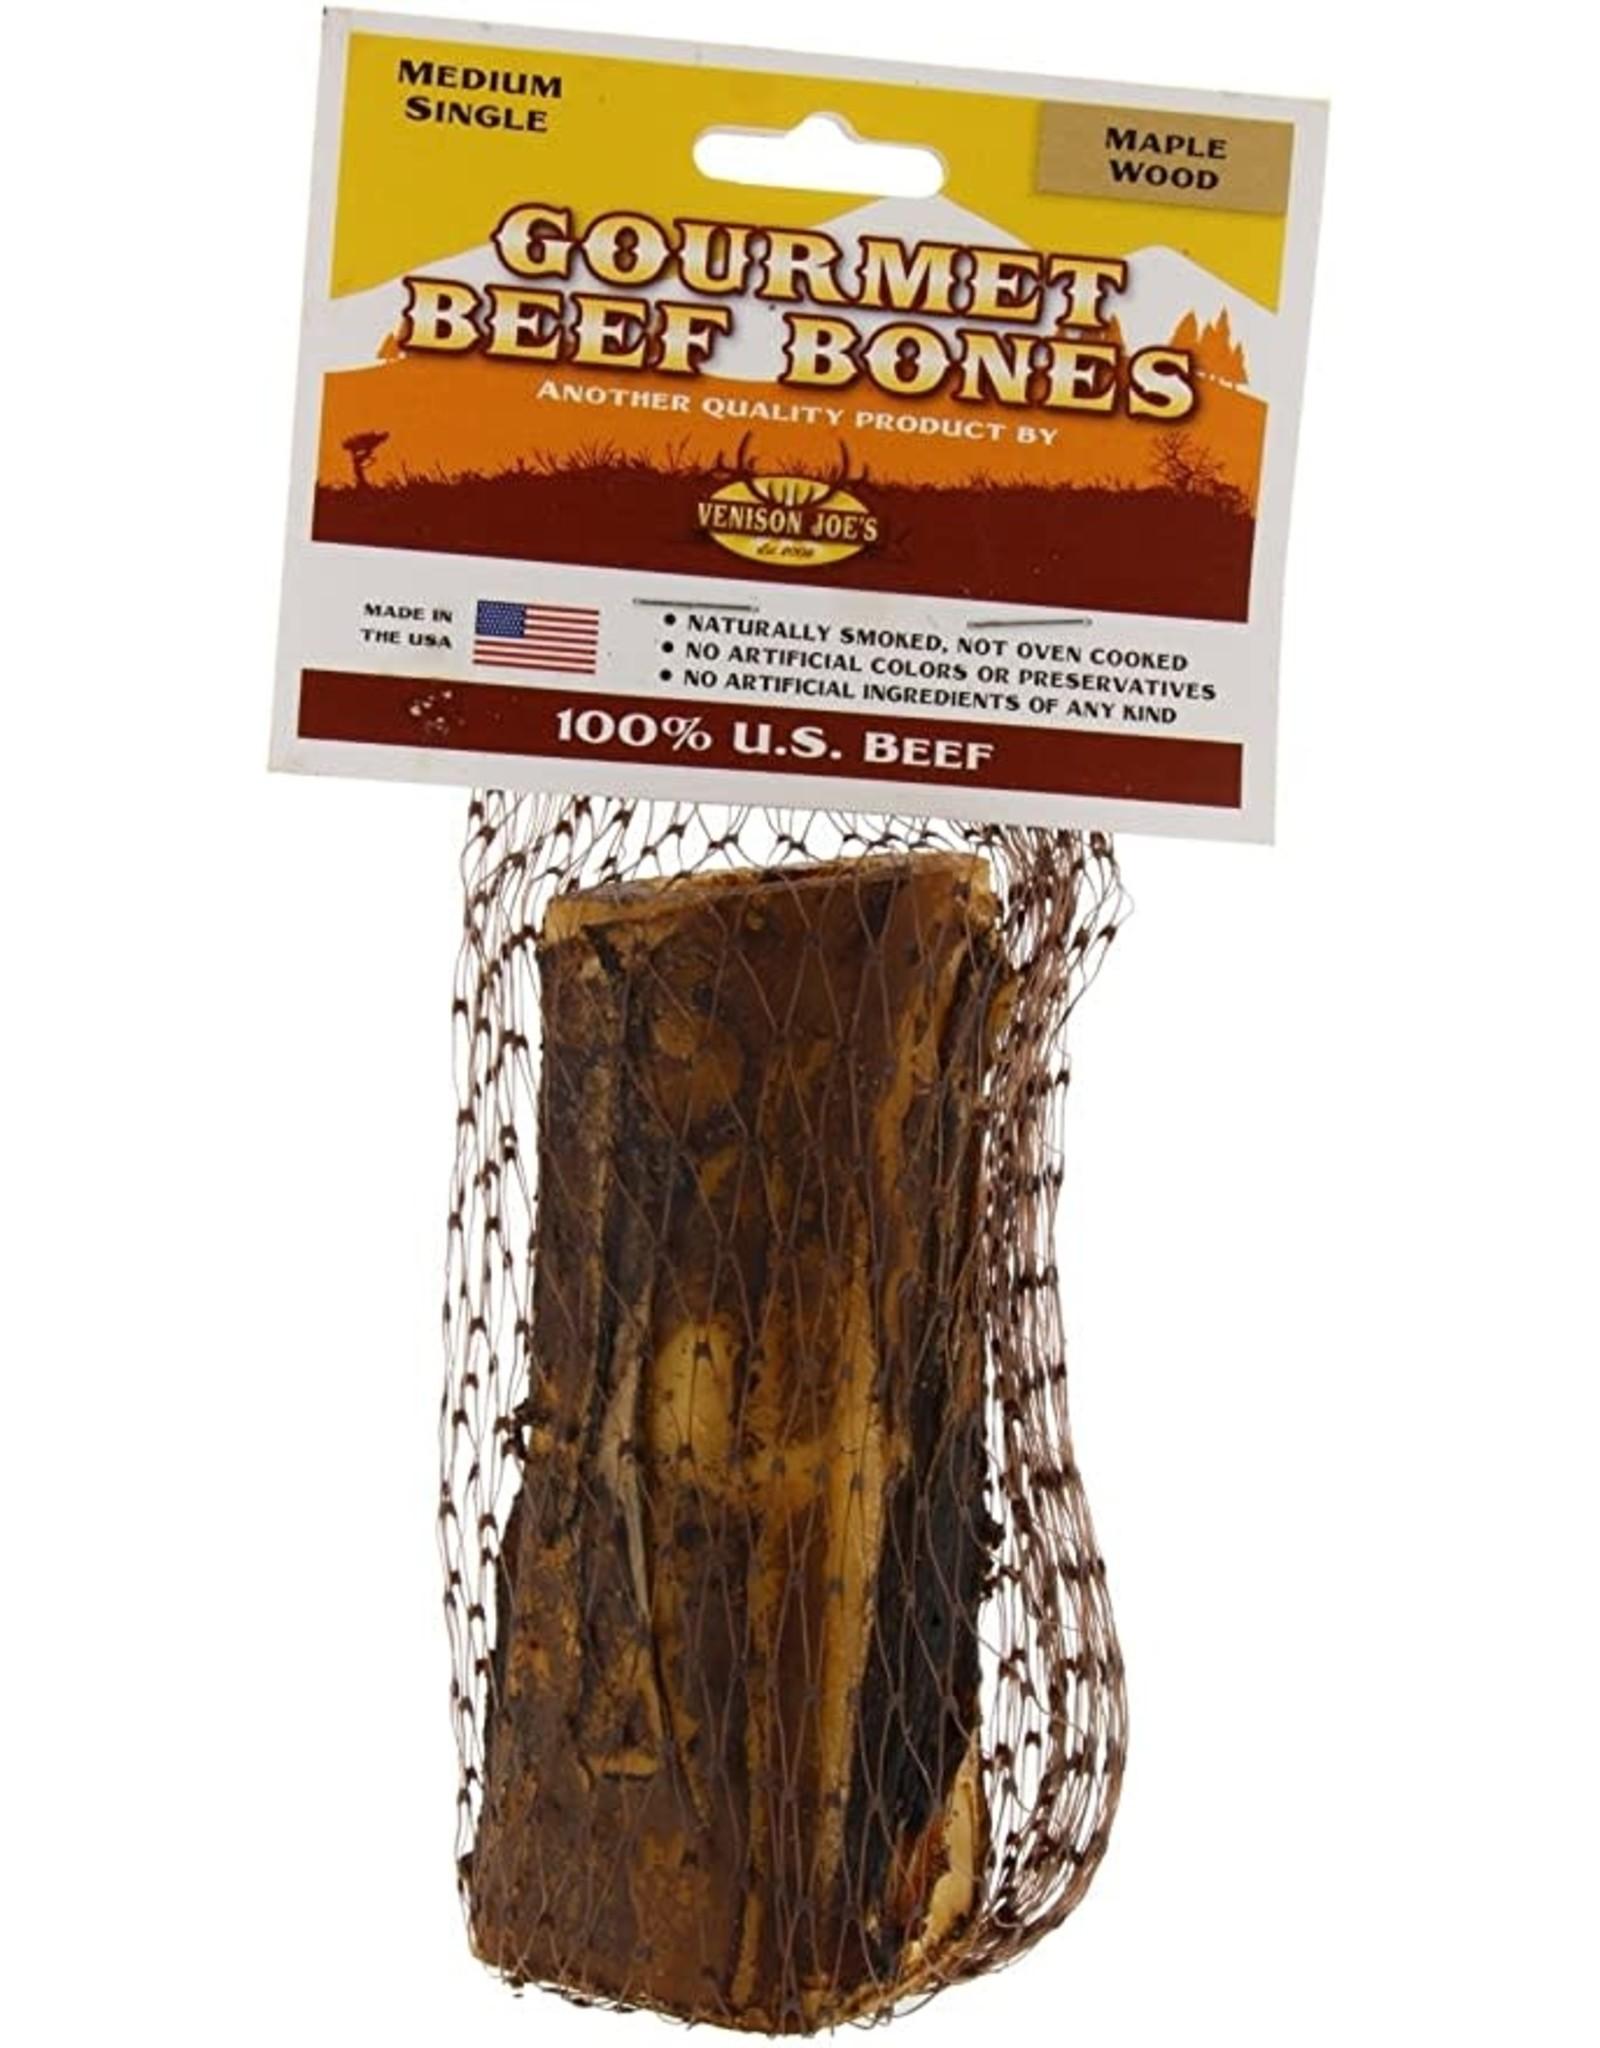 Venison Joes Venison Joe's Beef Bones: Maple Wood Smoked